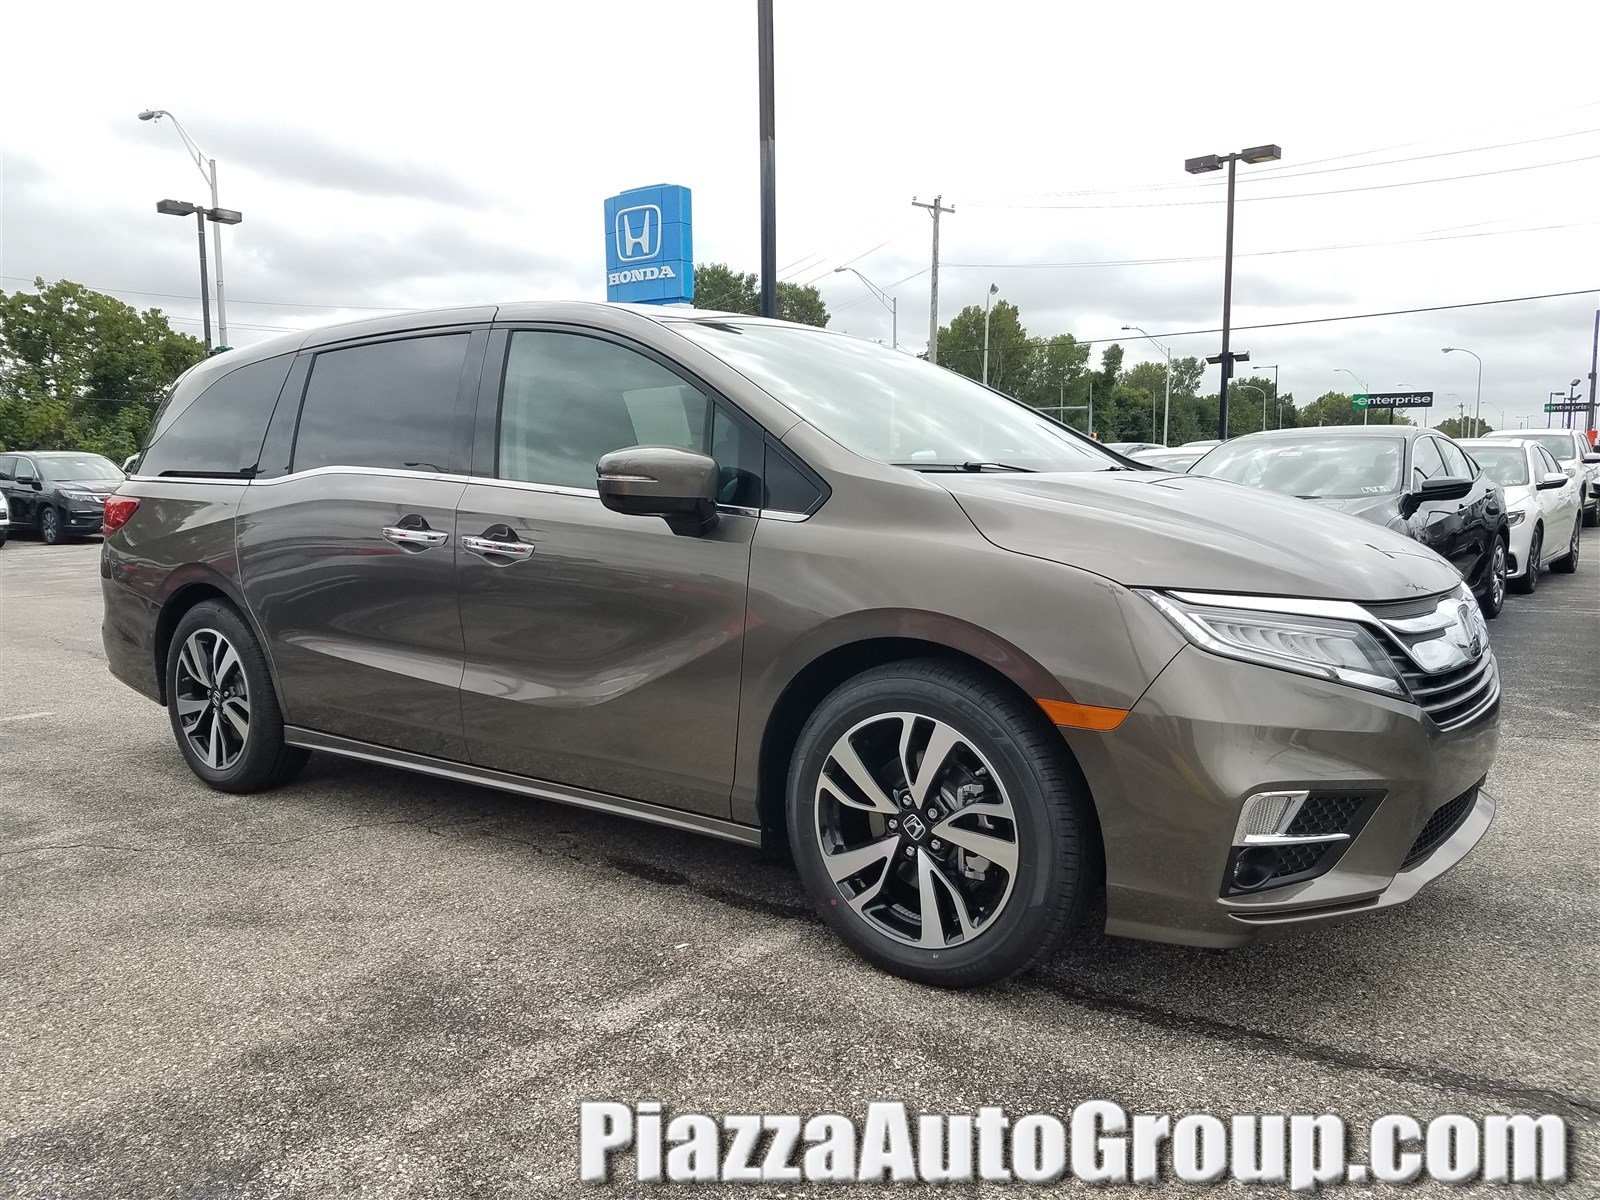 New 2019 Honda Odyssey Elite Van Philadelphia, PA